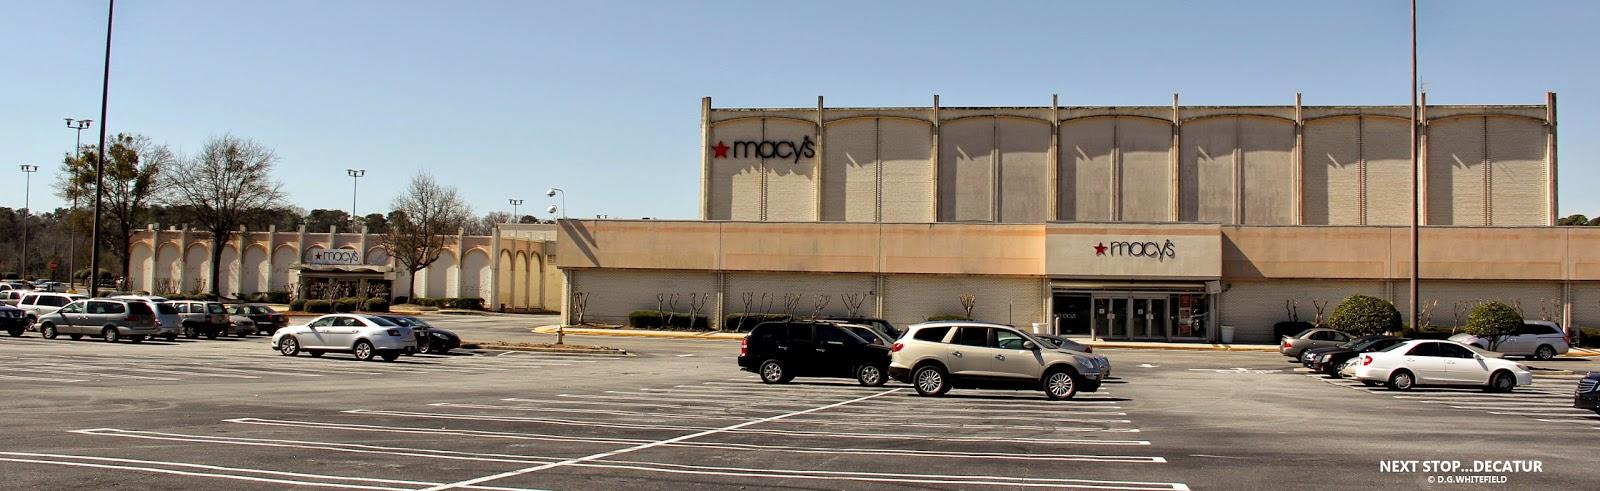 North dekalb mall movie theater